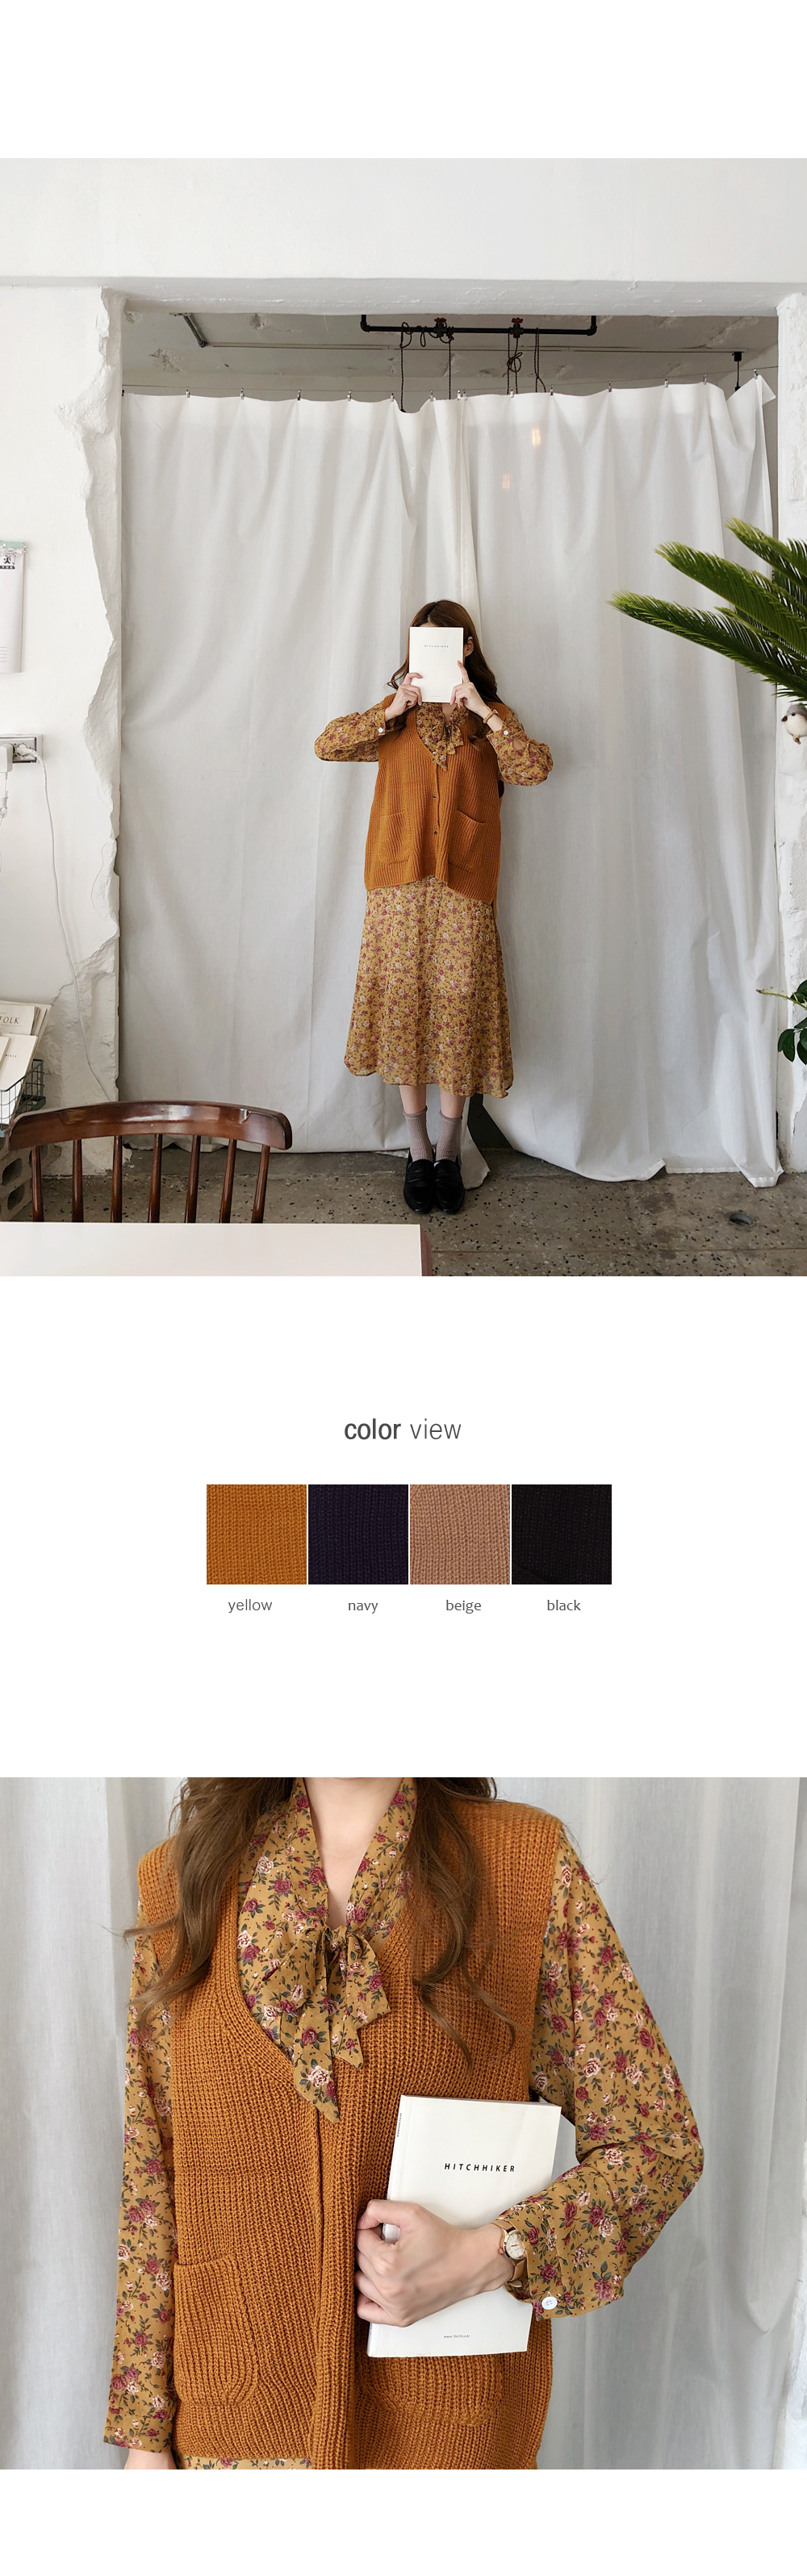 Basic Style Knit Best